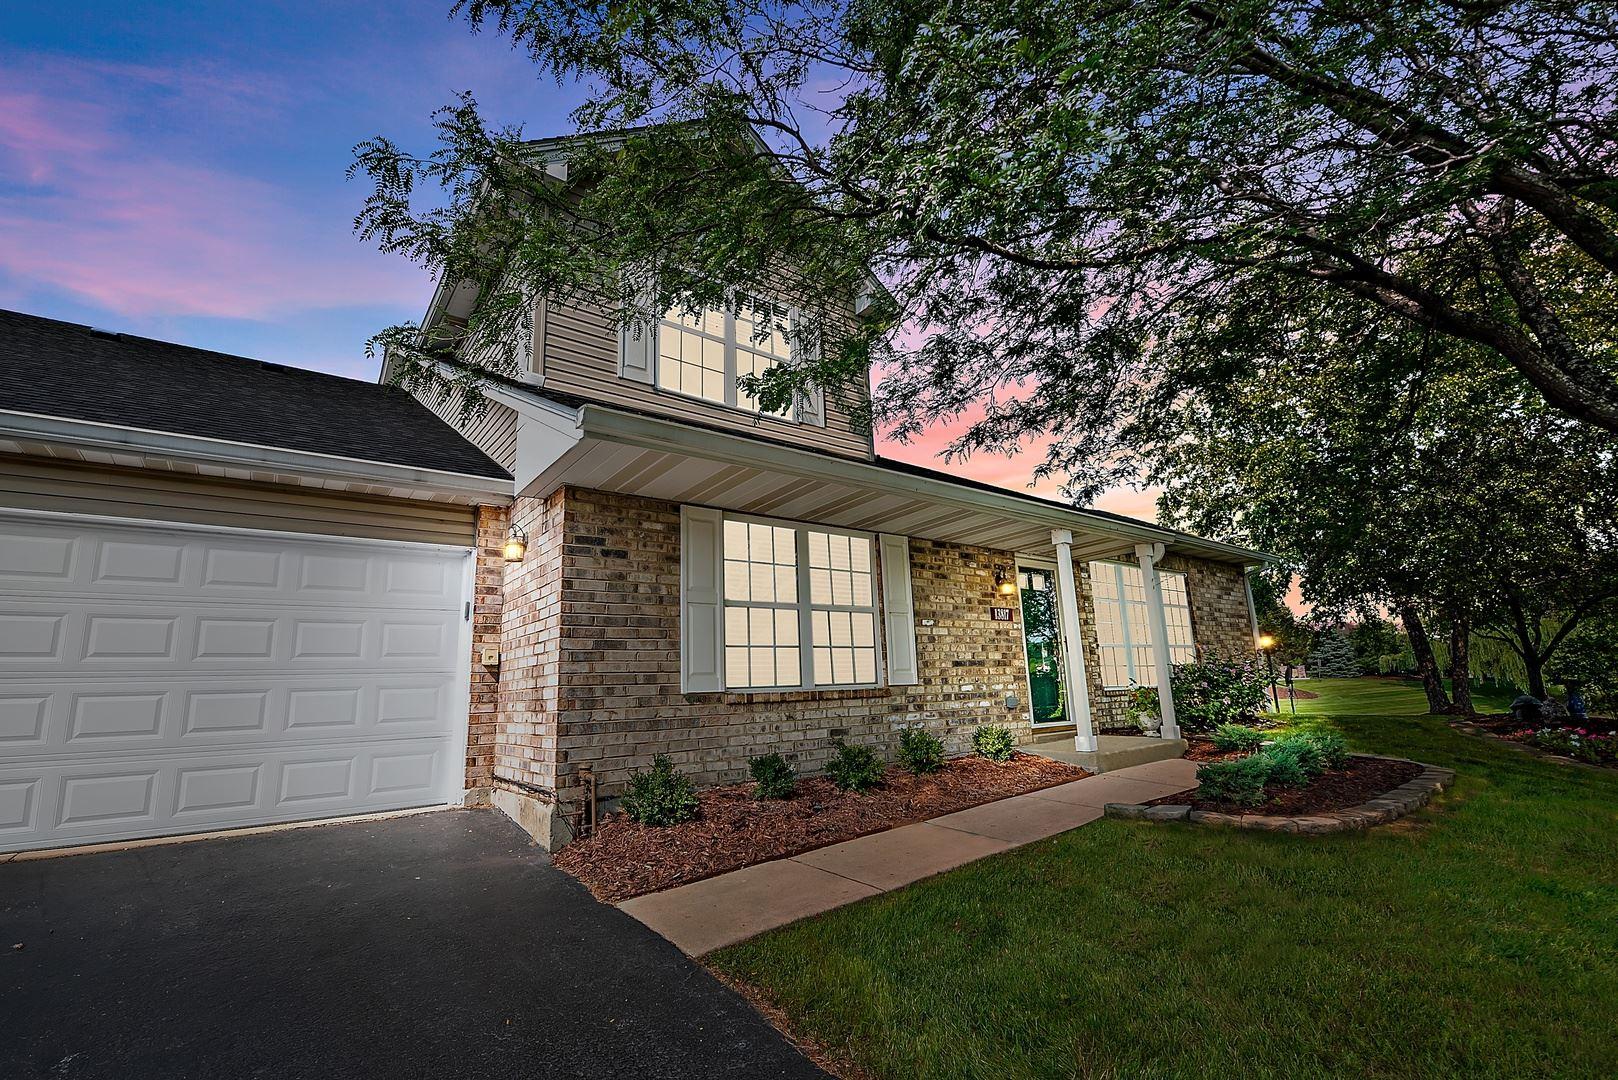 Photo of 13817 Cambridge Circle, Plainfield, IL 60544 (MLS # 11164015)